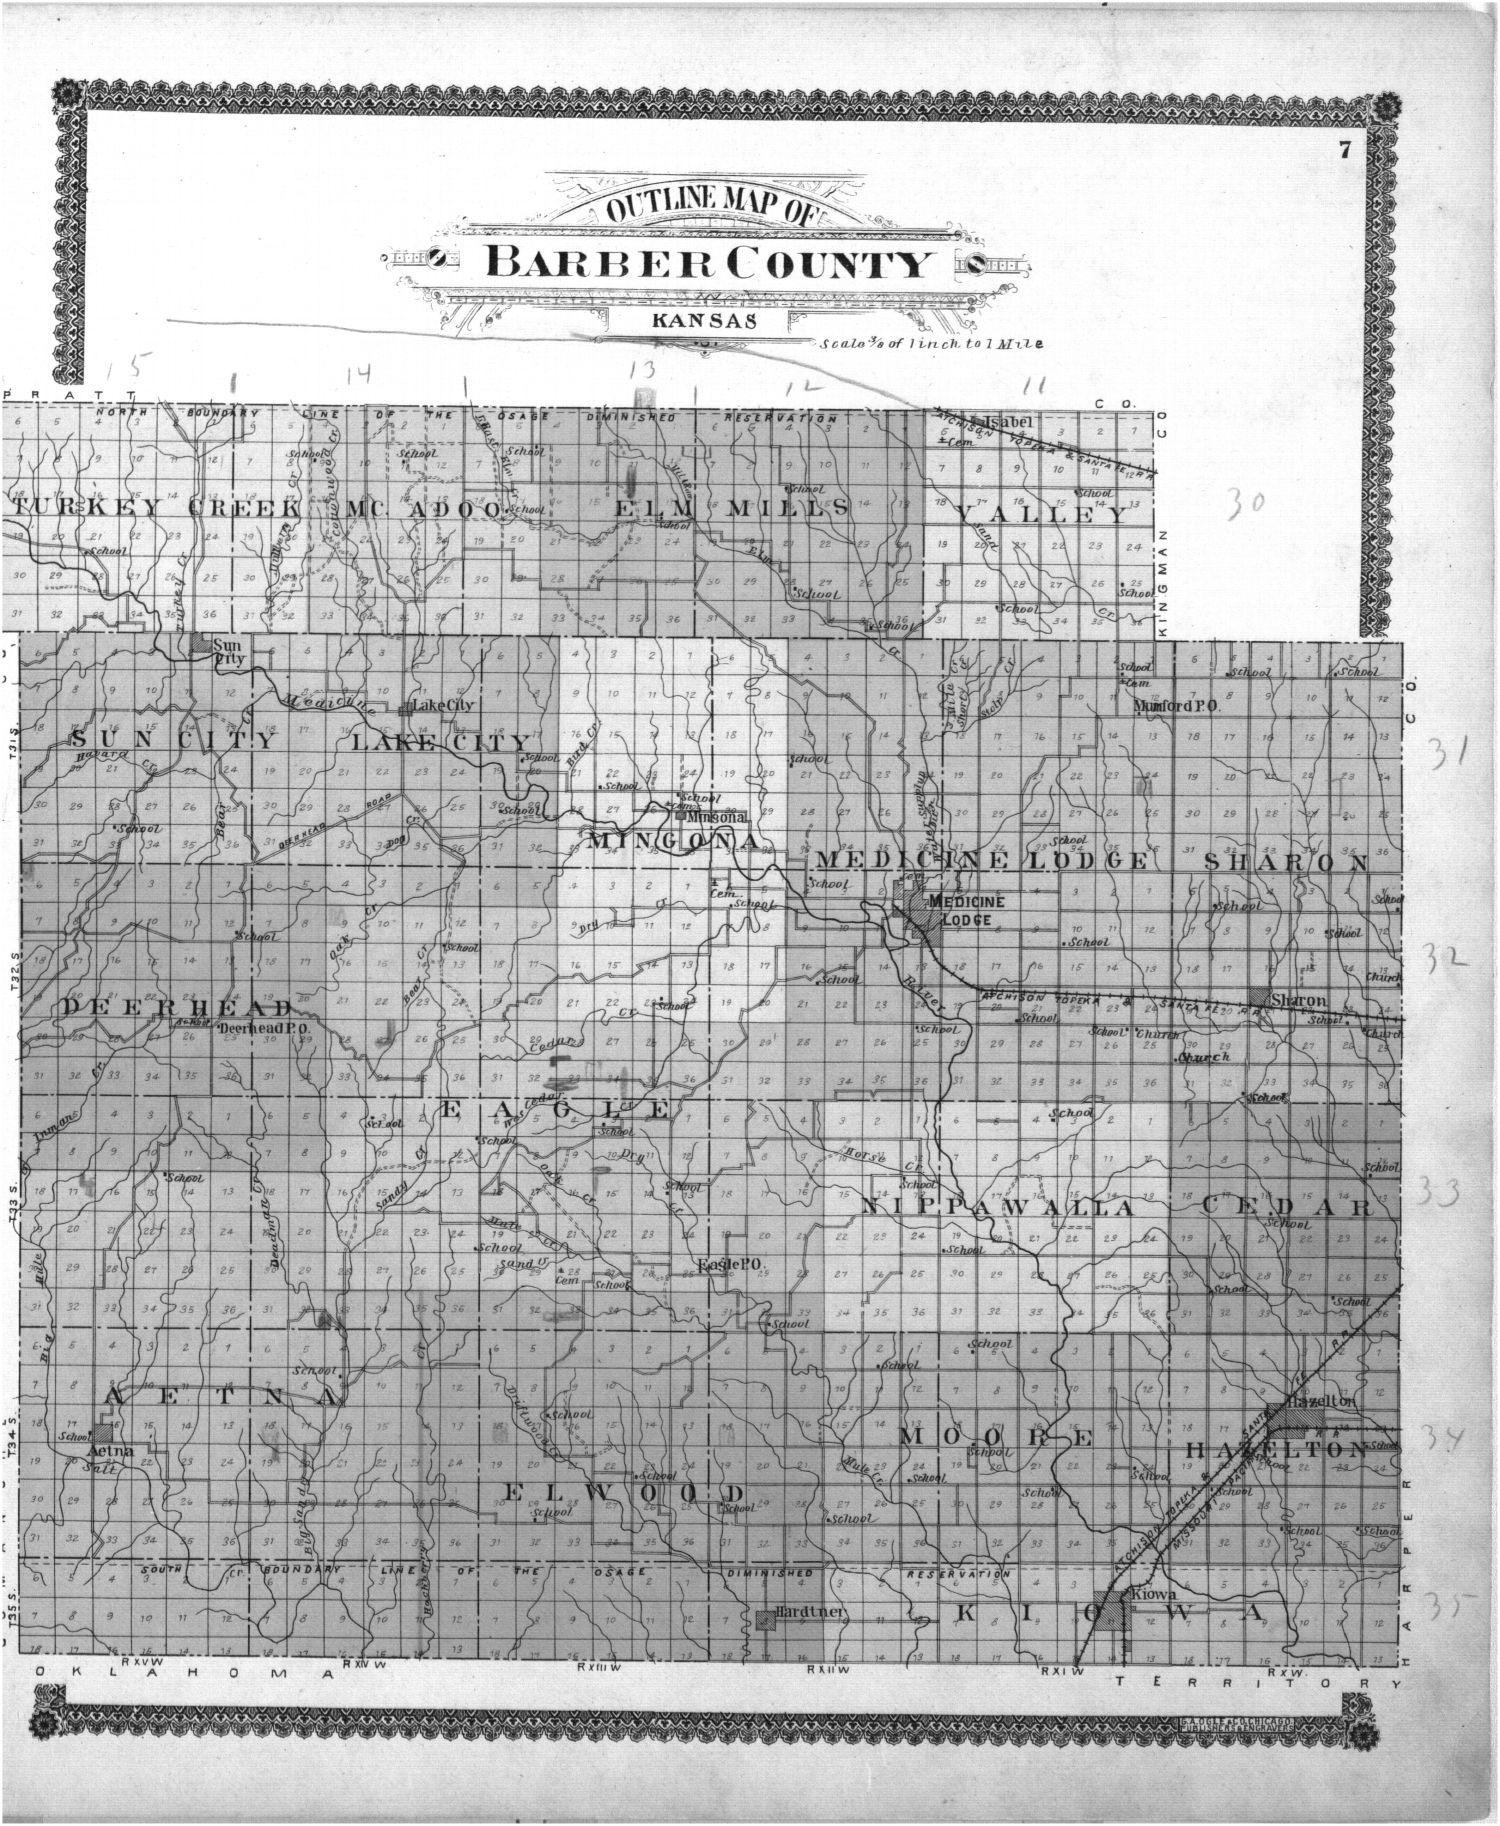 Standard atlas of Barber County, Kansas - 7